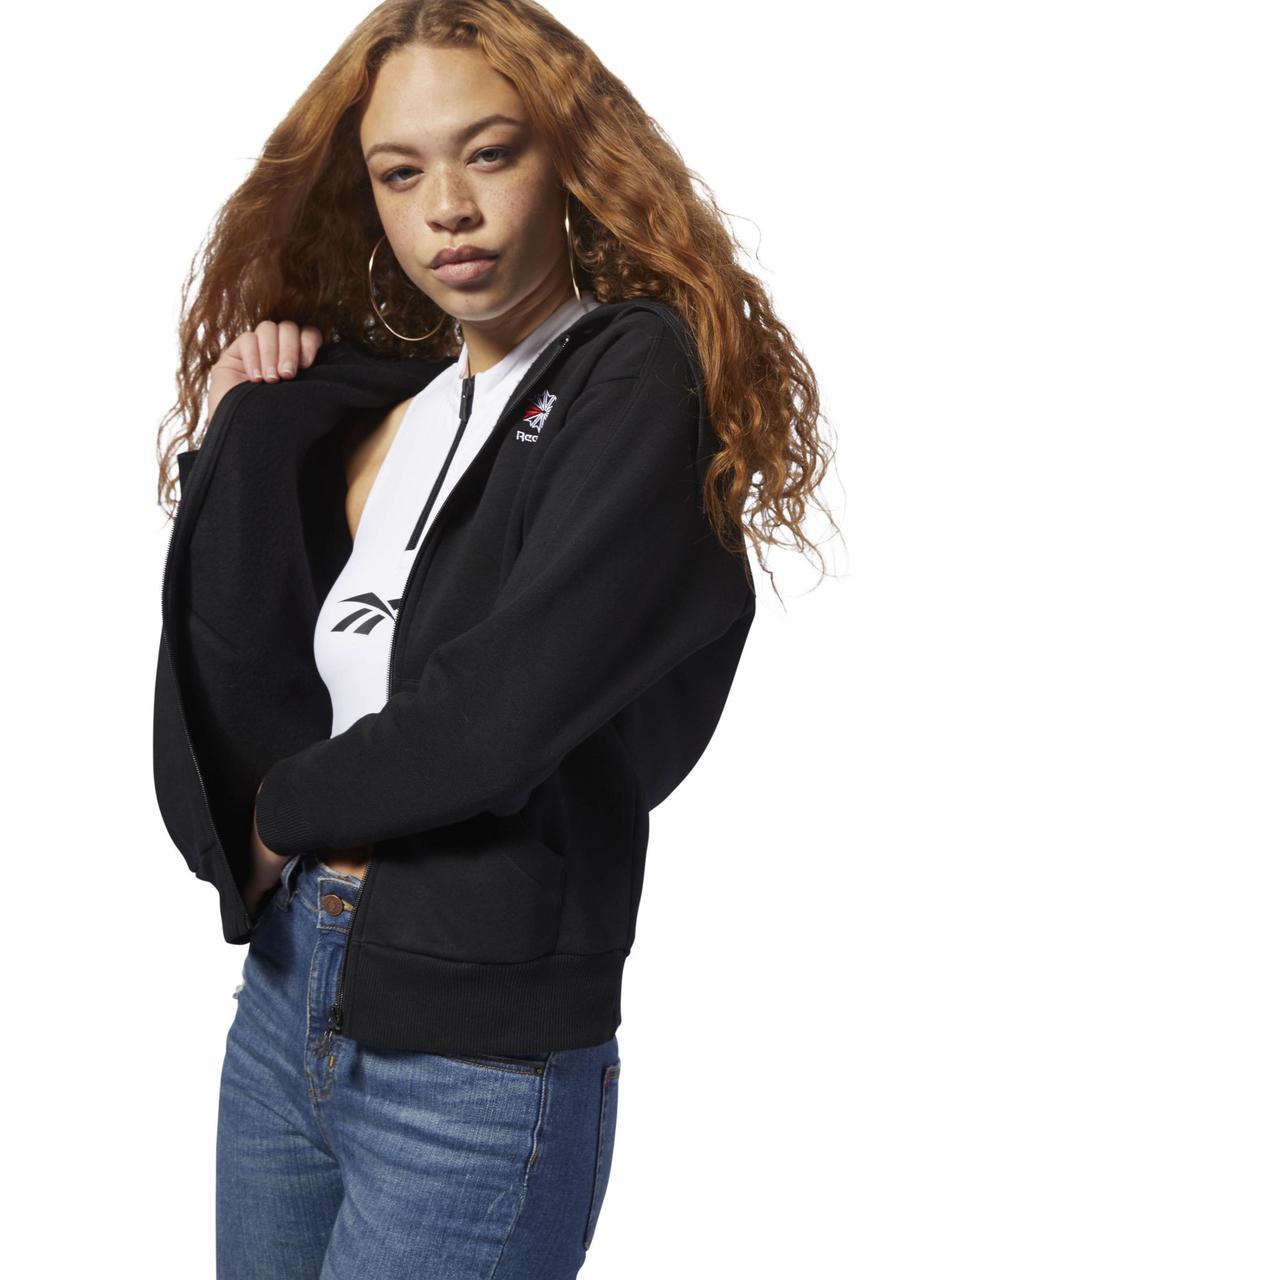 Женская толстовка Reebok Classic Fleece Zip - Up (Артикул: DH1376)